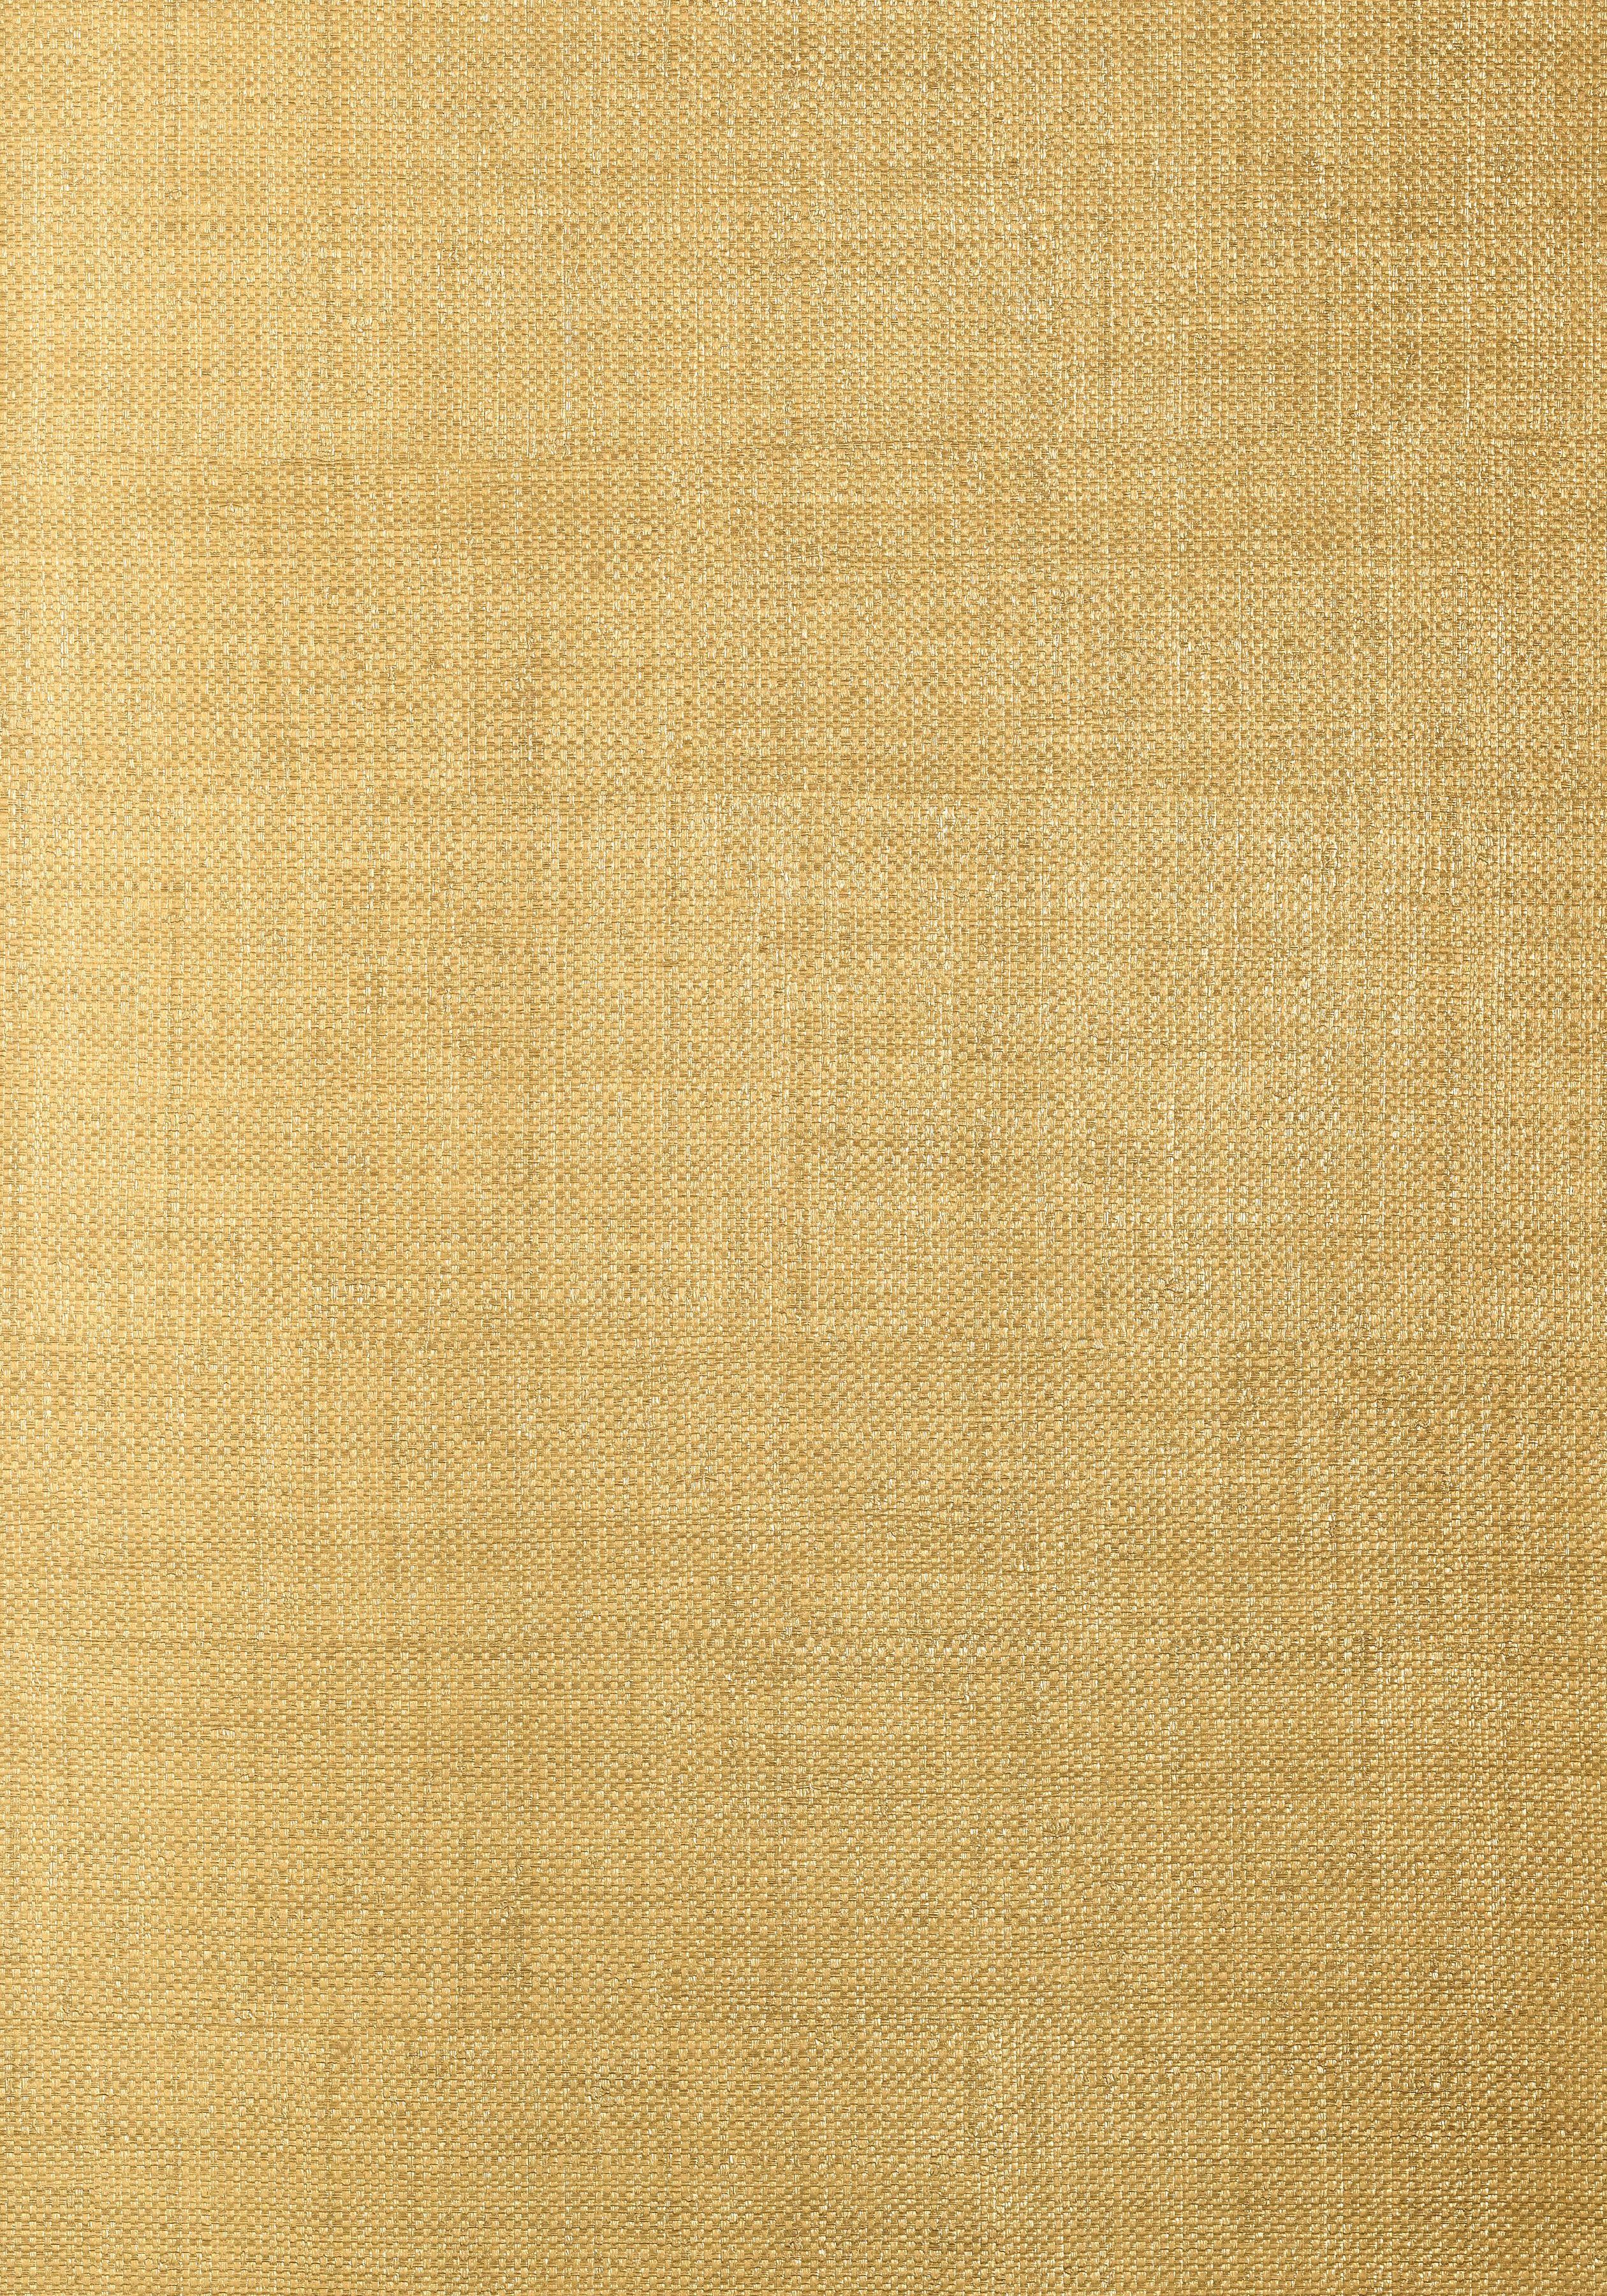 Bankun Raffia Metallic Gold T14133 Collection Texture